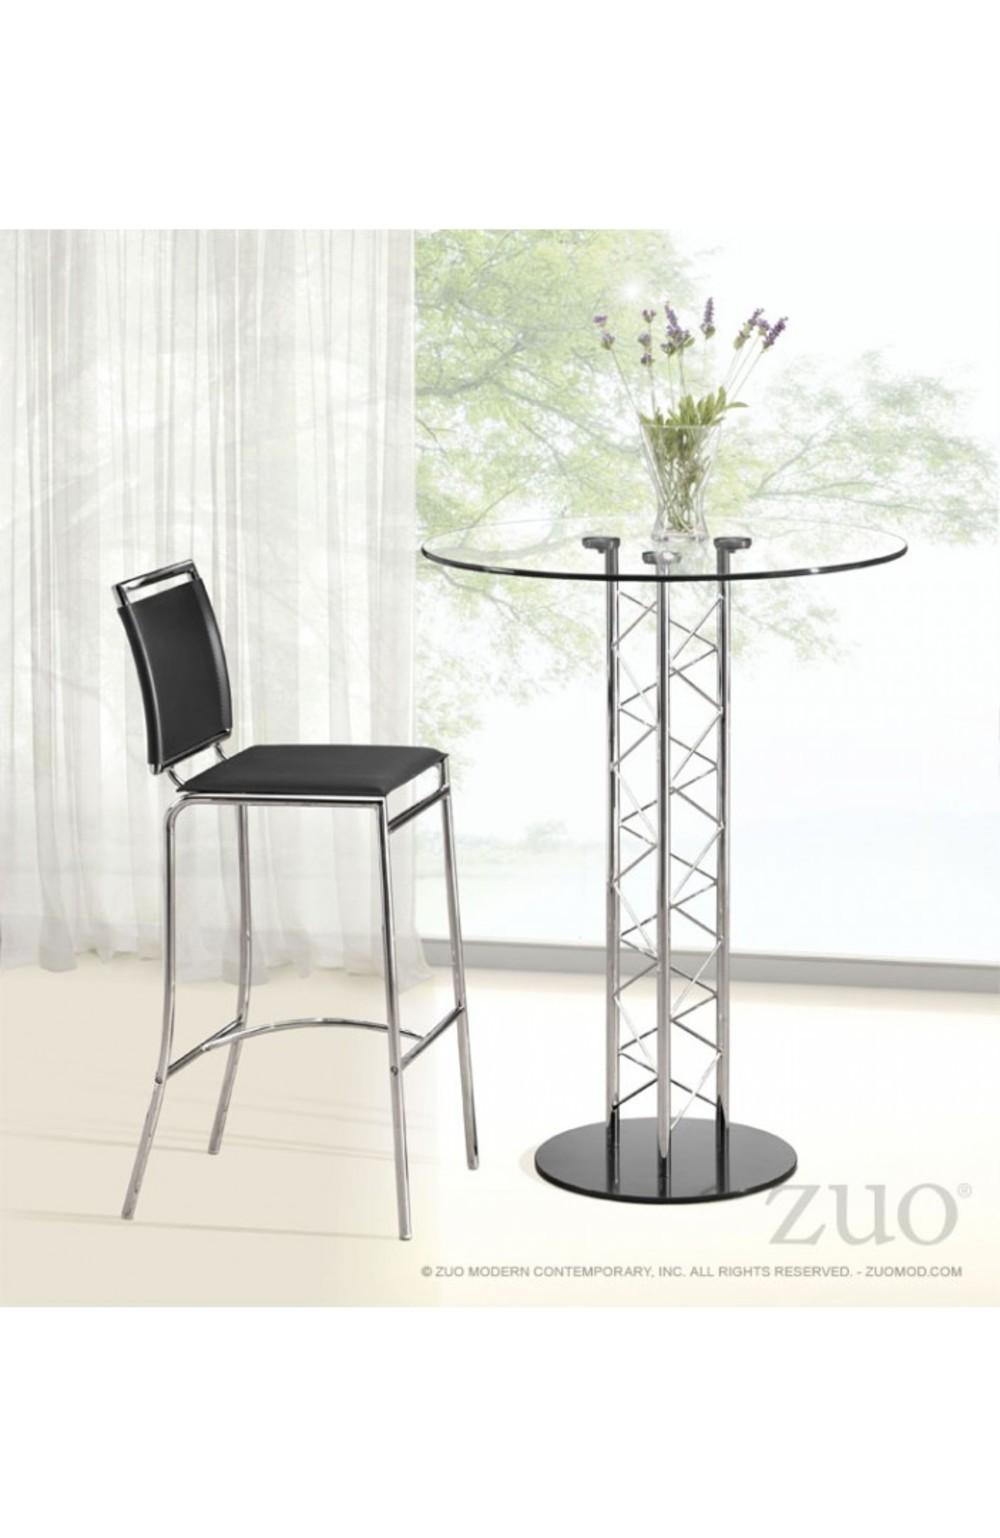 Zuo Modern Contemporary - Chardonnay Bar Table Chrome